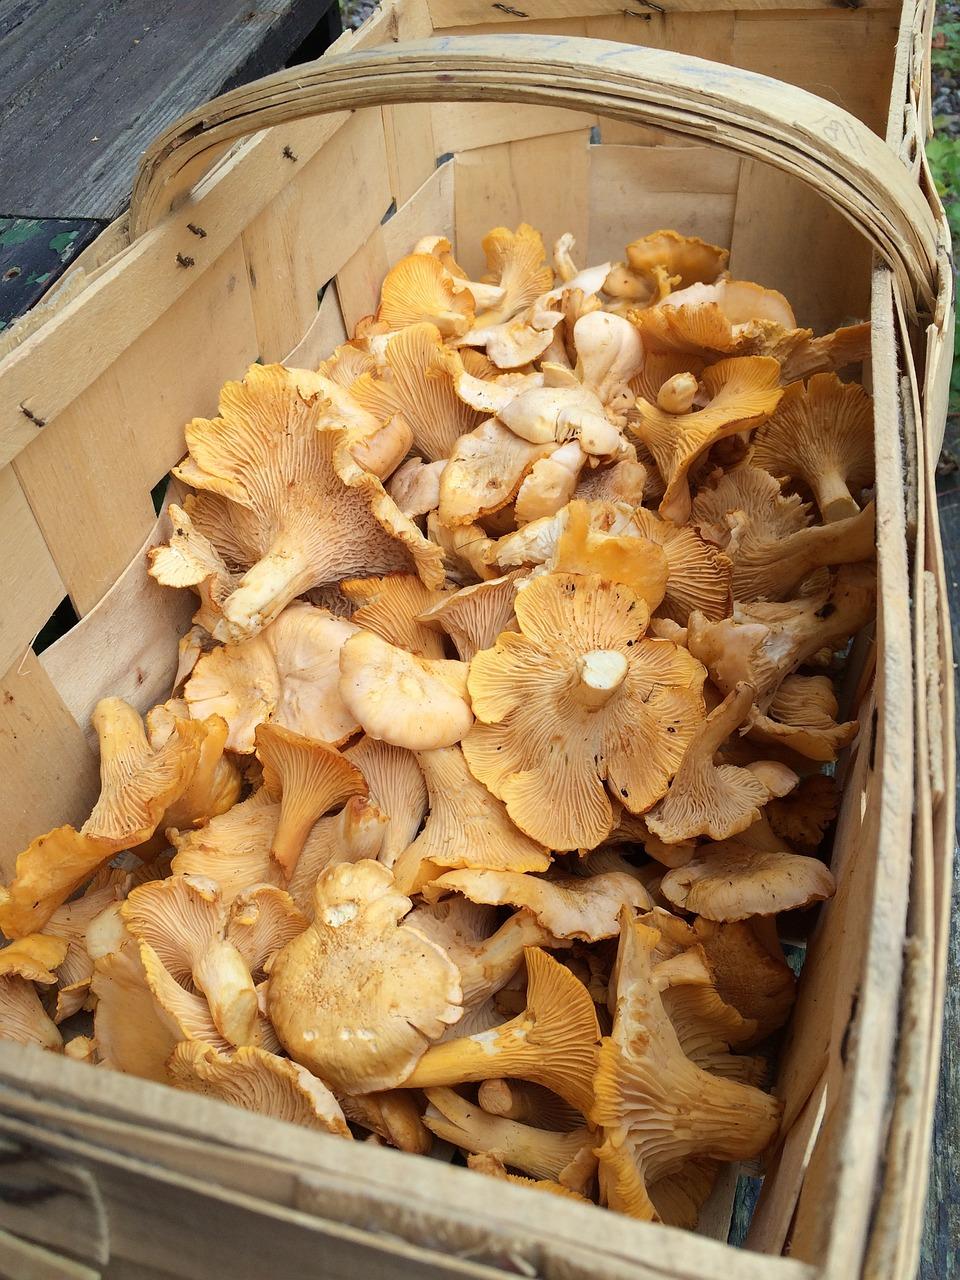 Photos of chanterelle mushrooms Chanterelle Mushroom Lookalikes - Know Your Chanties!